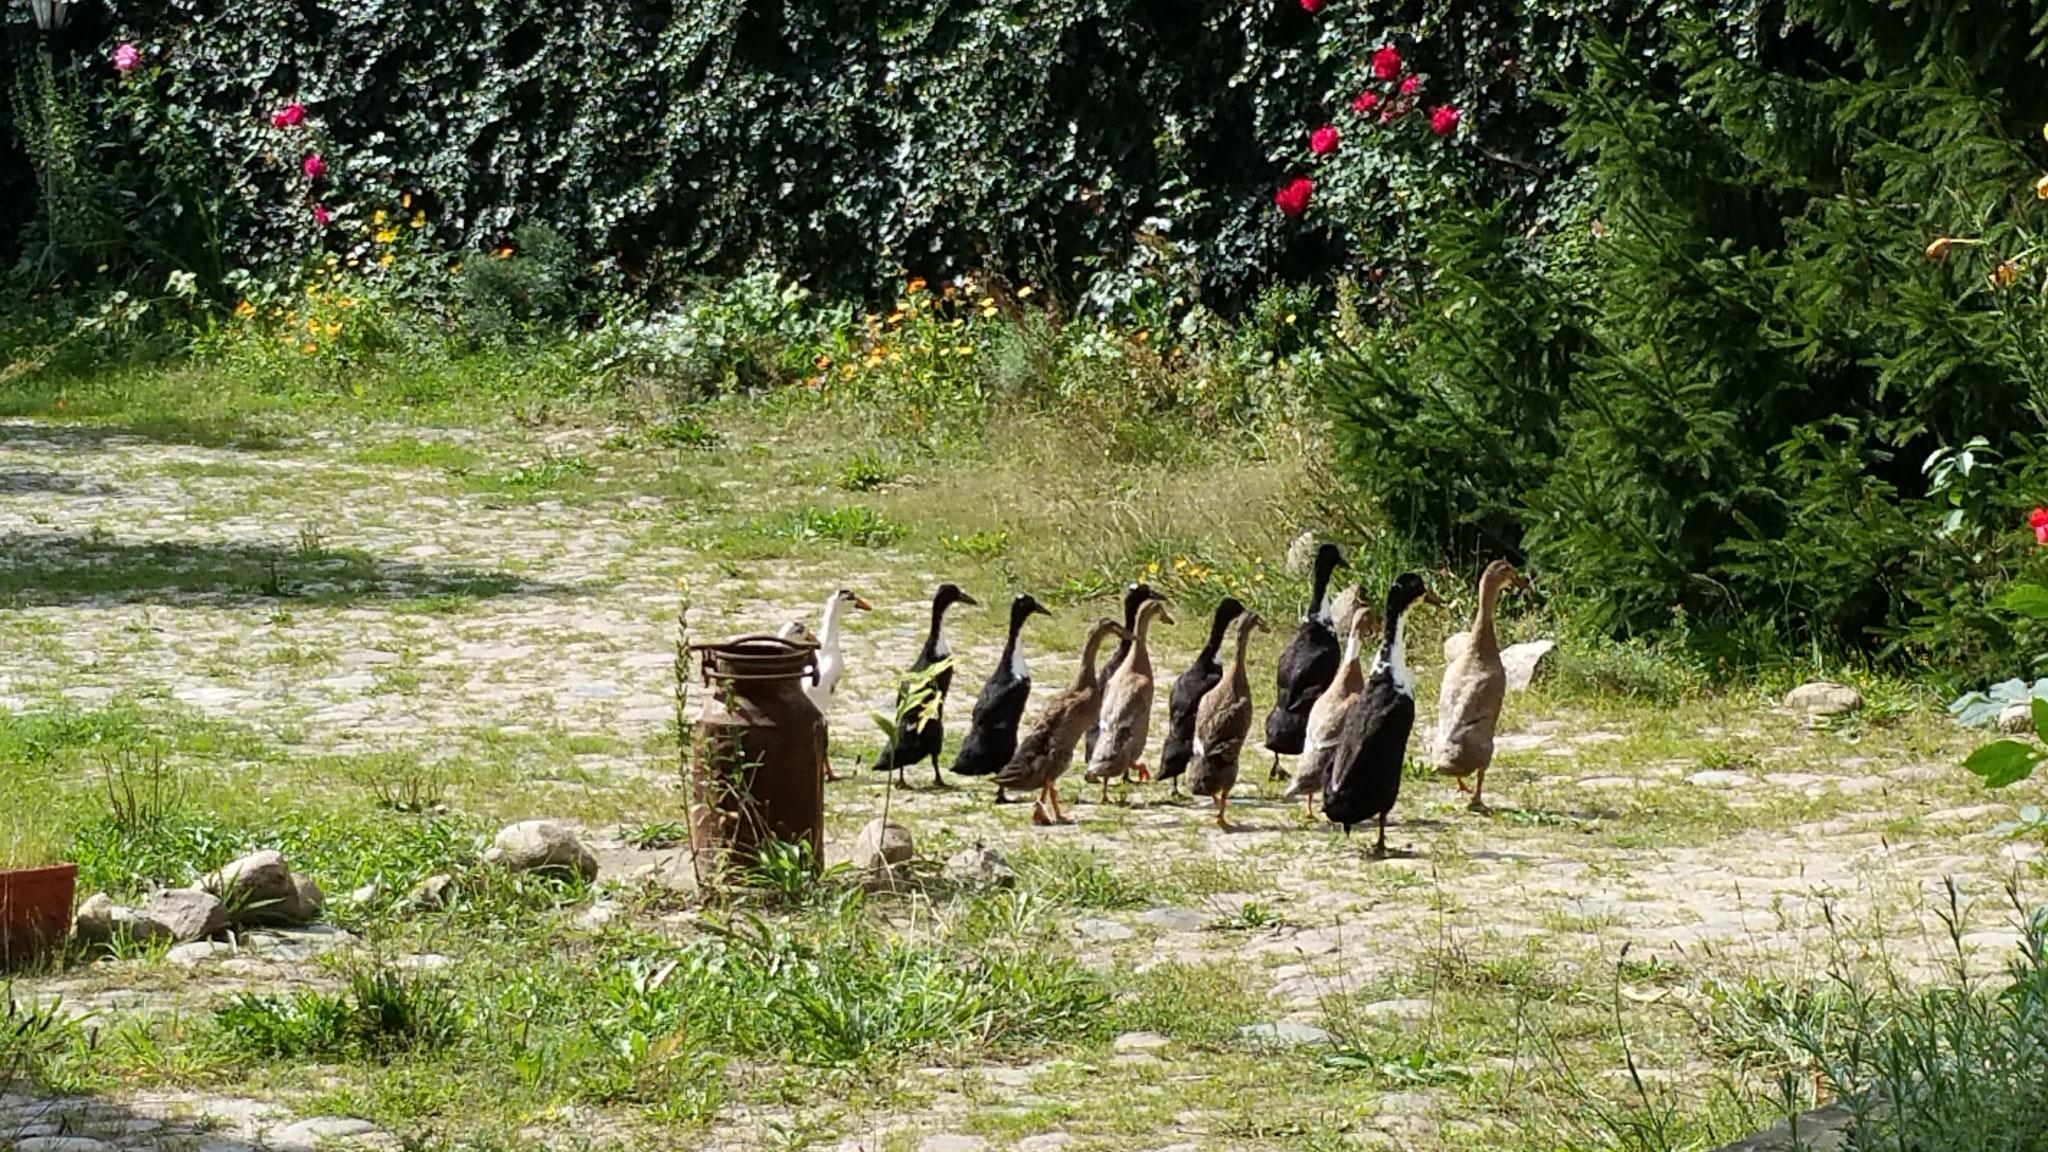 Laufenten auf dem Hof. Foto: J. de Gruyter